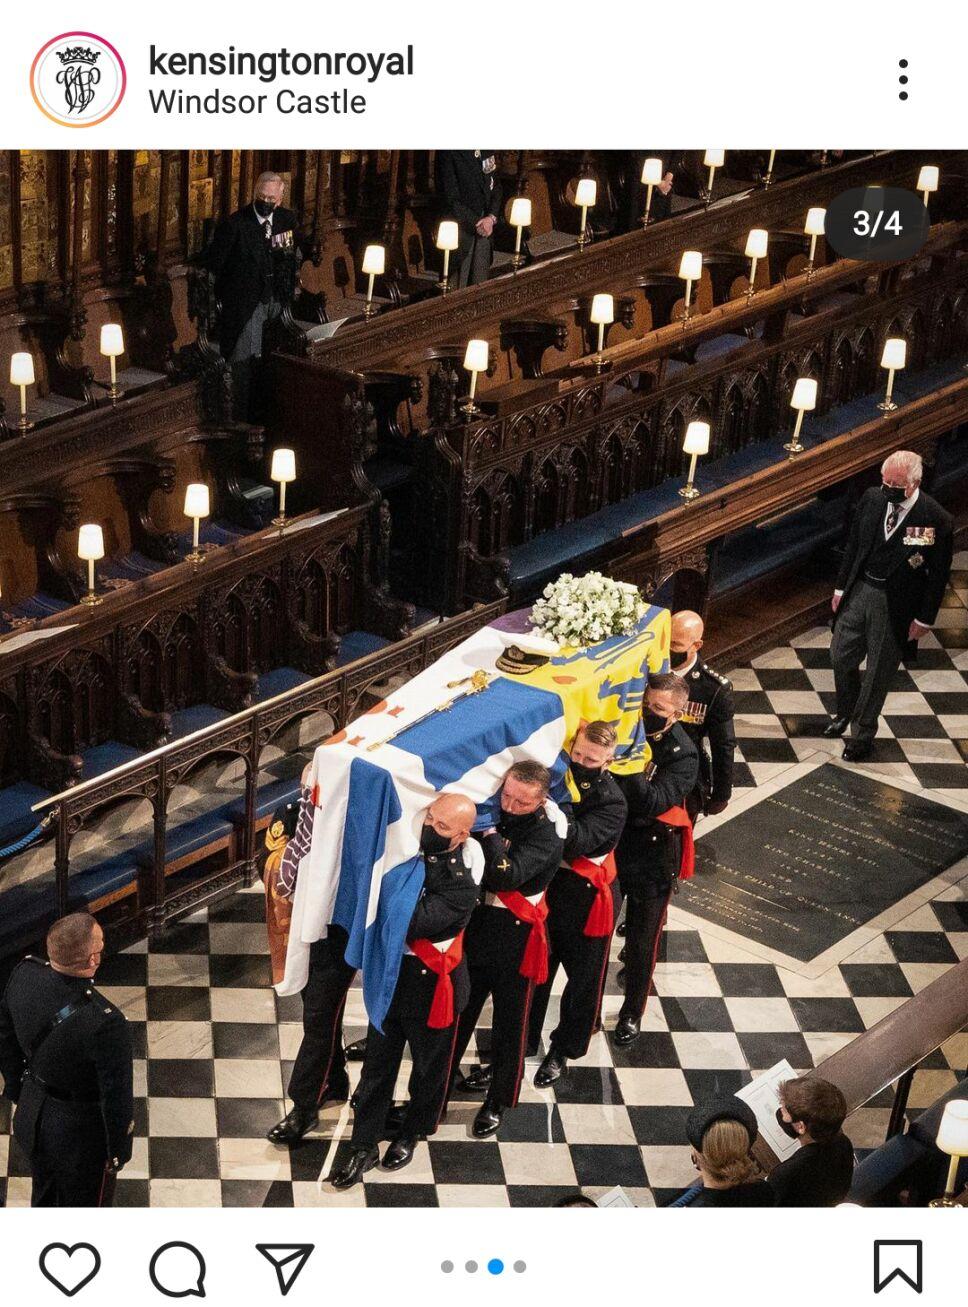 Funeral príncipe de Edimburgo